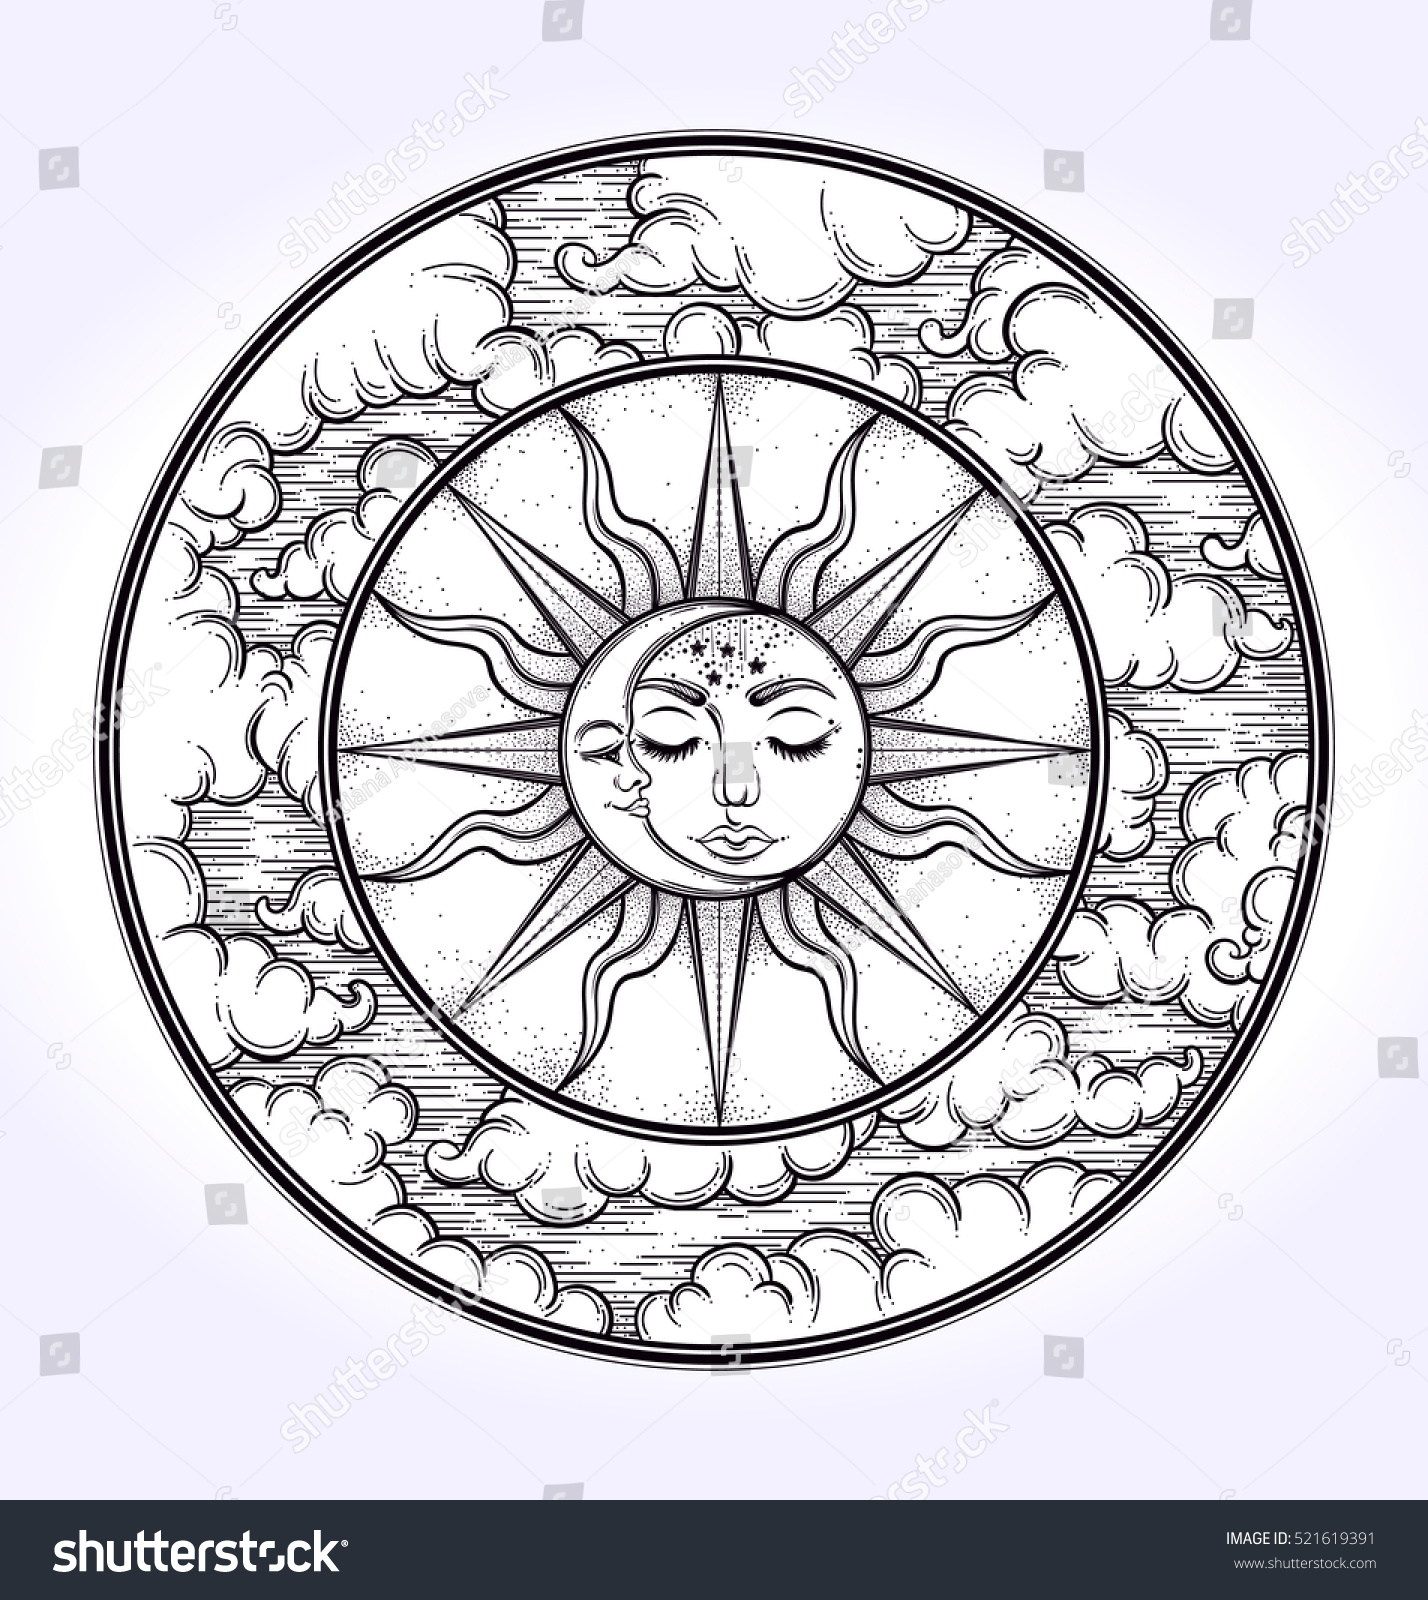 vintage elegant hand draw work of moon sun night sky moon phase vintage elegant hand draw work of moon sun night sky moon phase